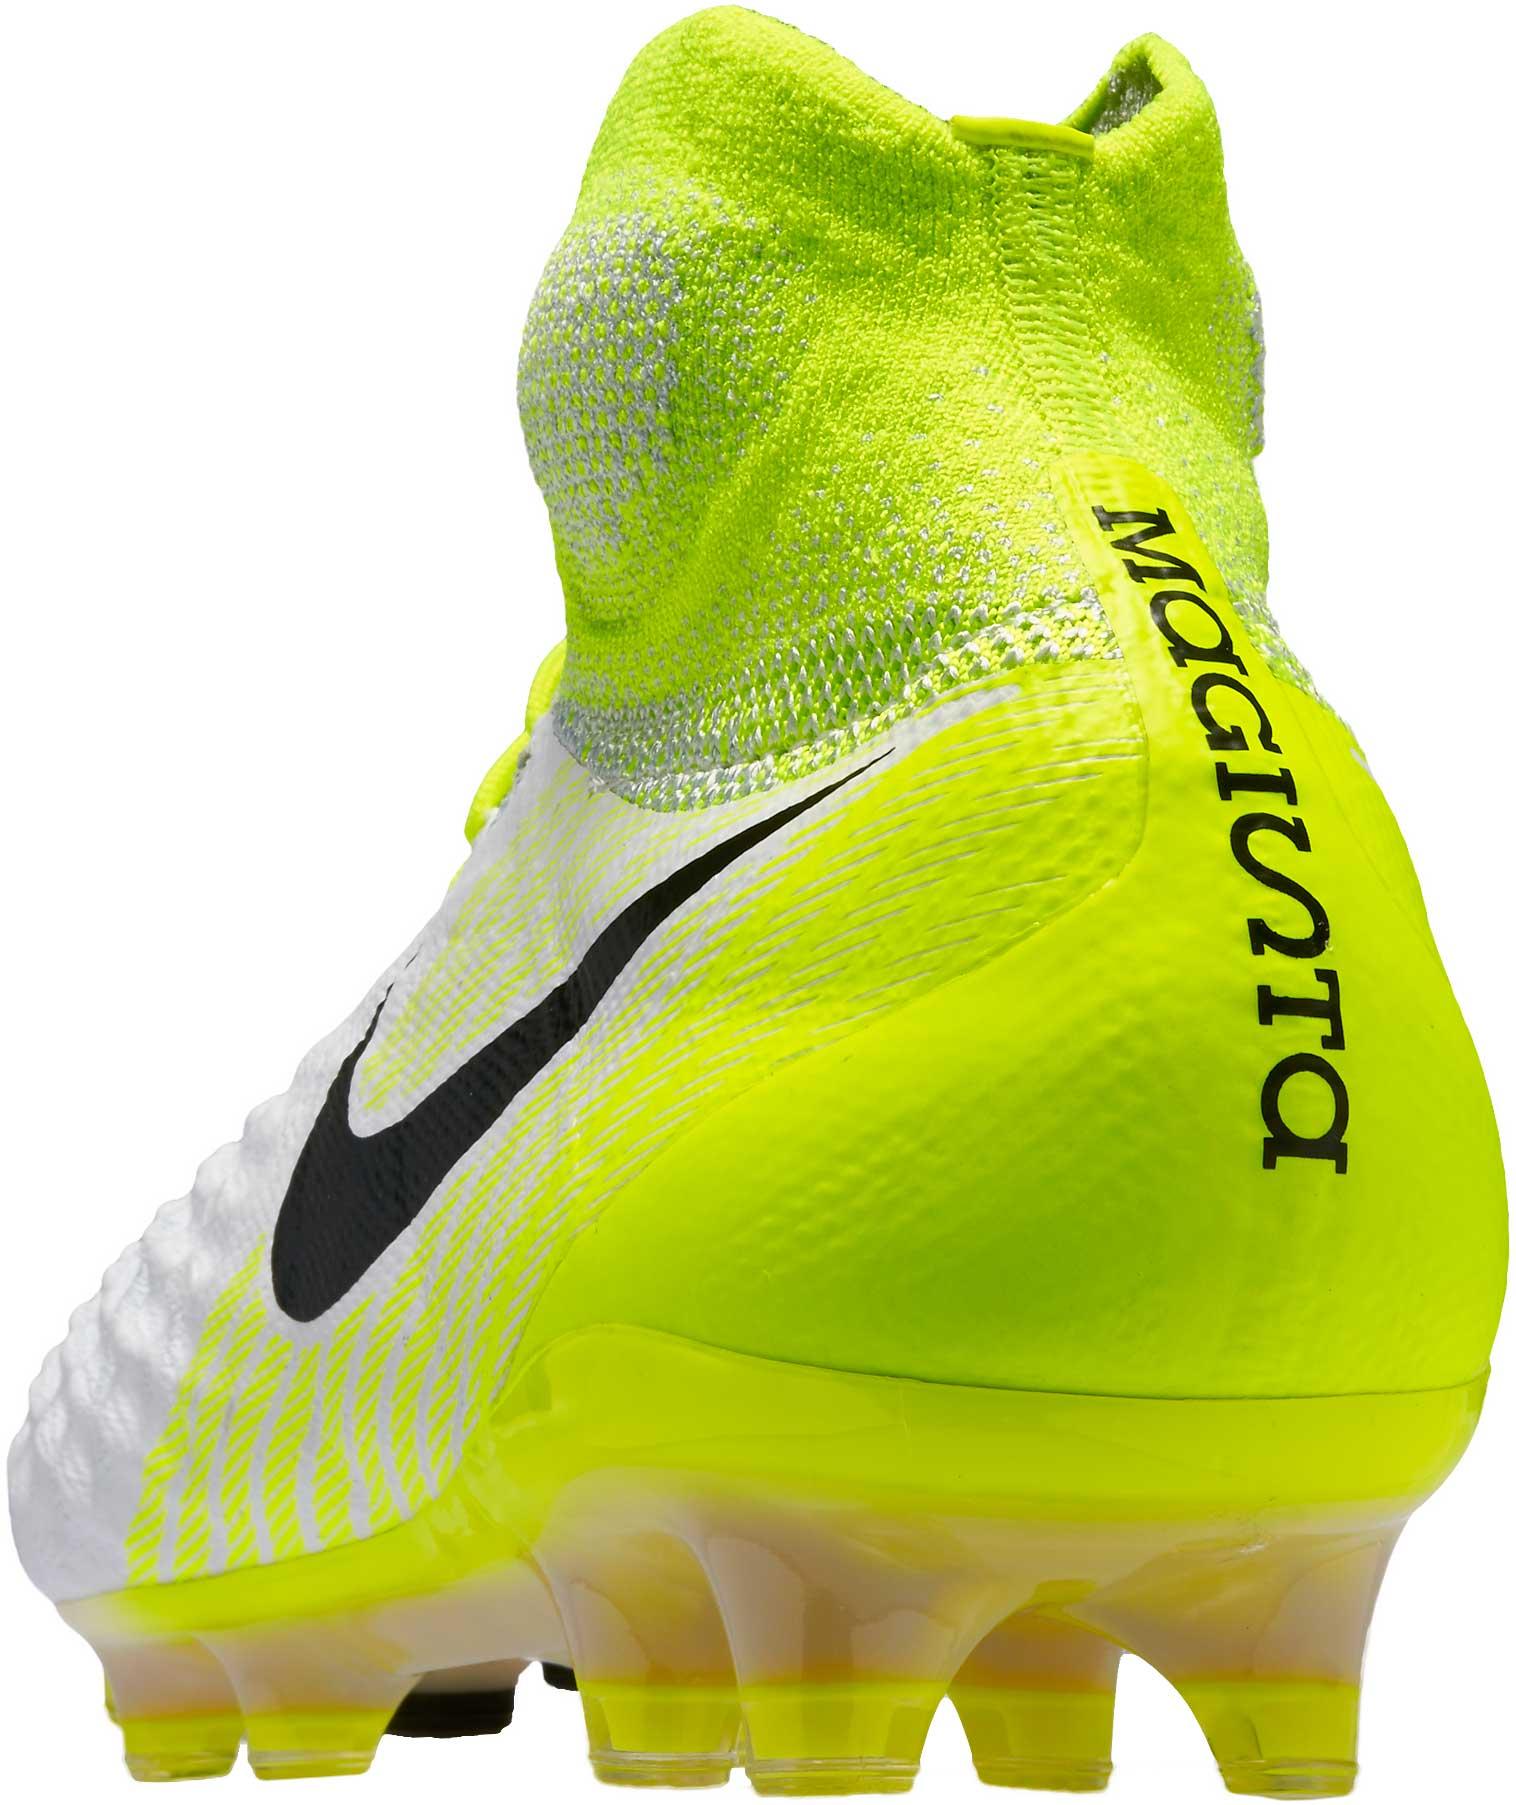 fb91f9784668 Nike Magista Obra II - White Magista Soccer Cleats